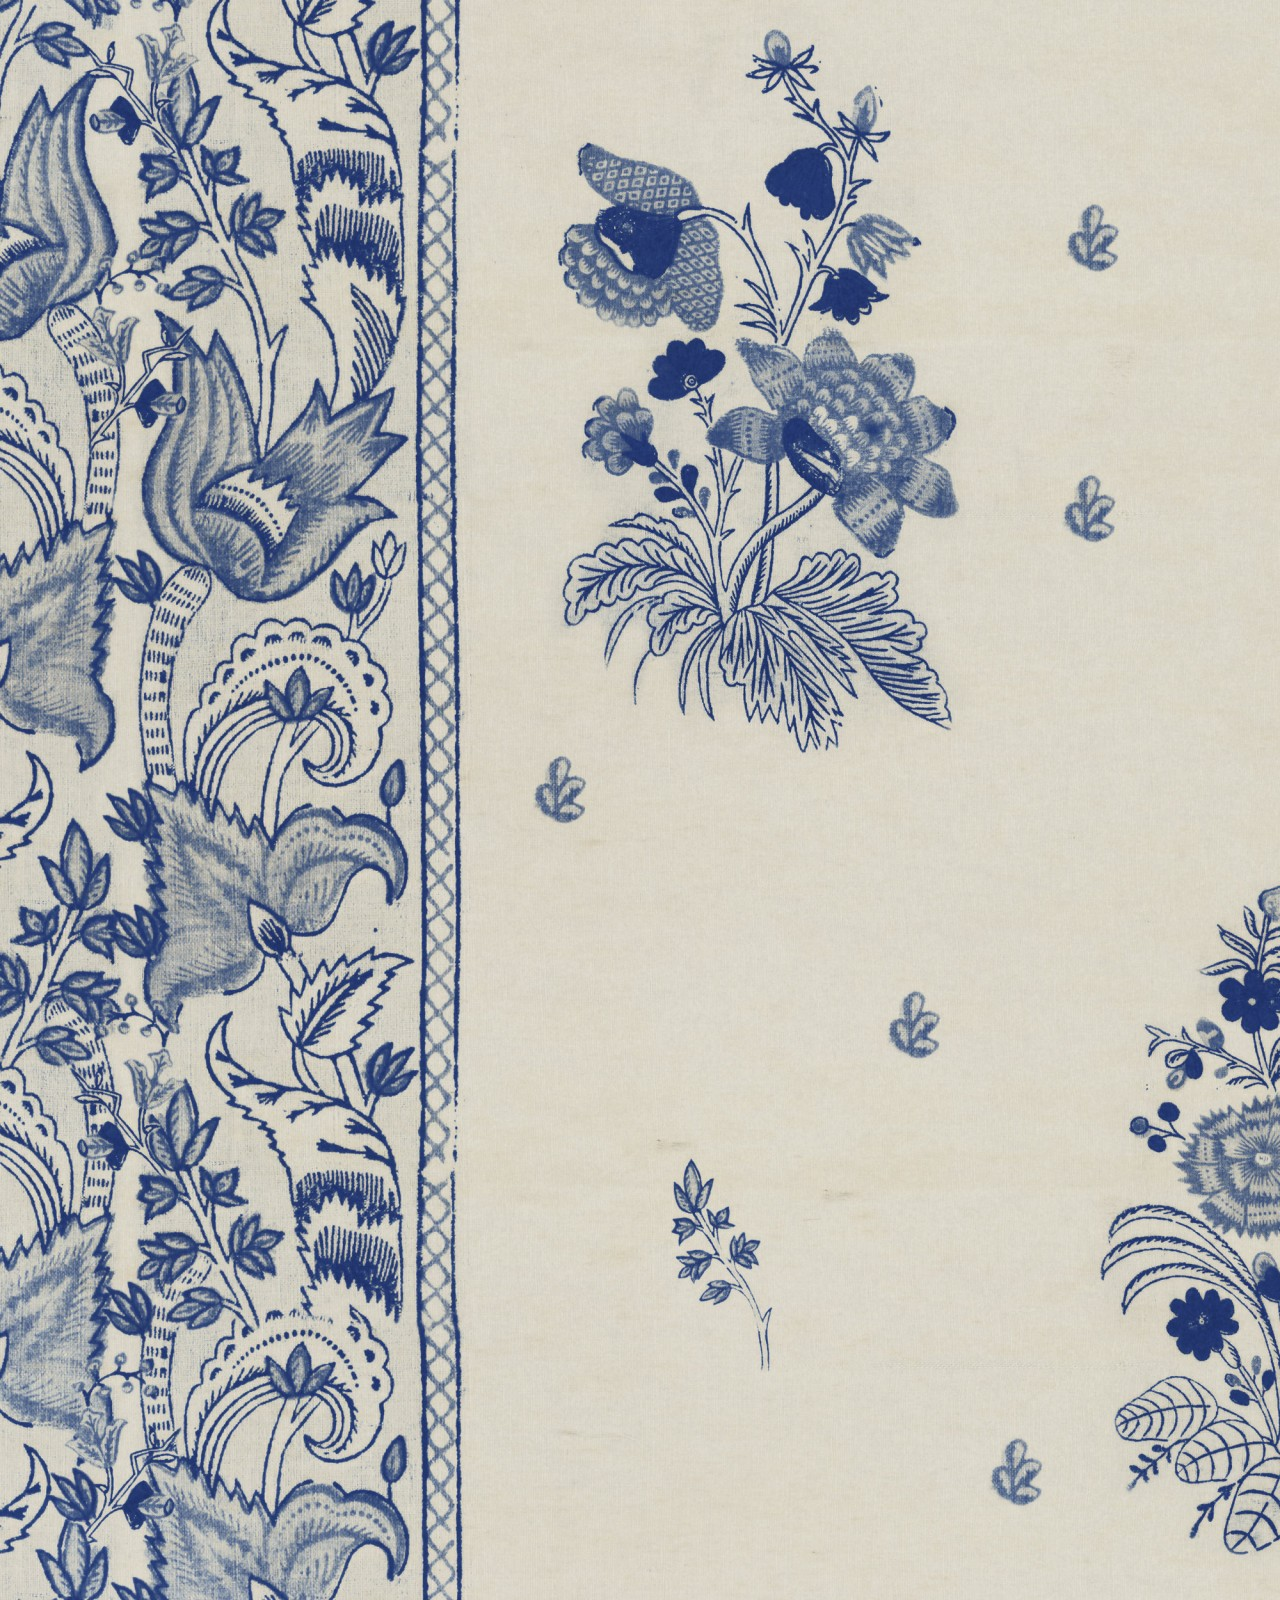 KOROND FLORAL Indigo Wallpaper